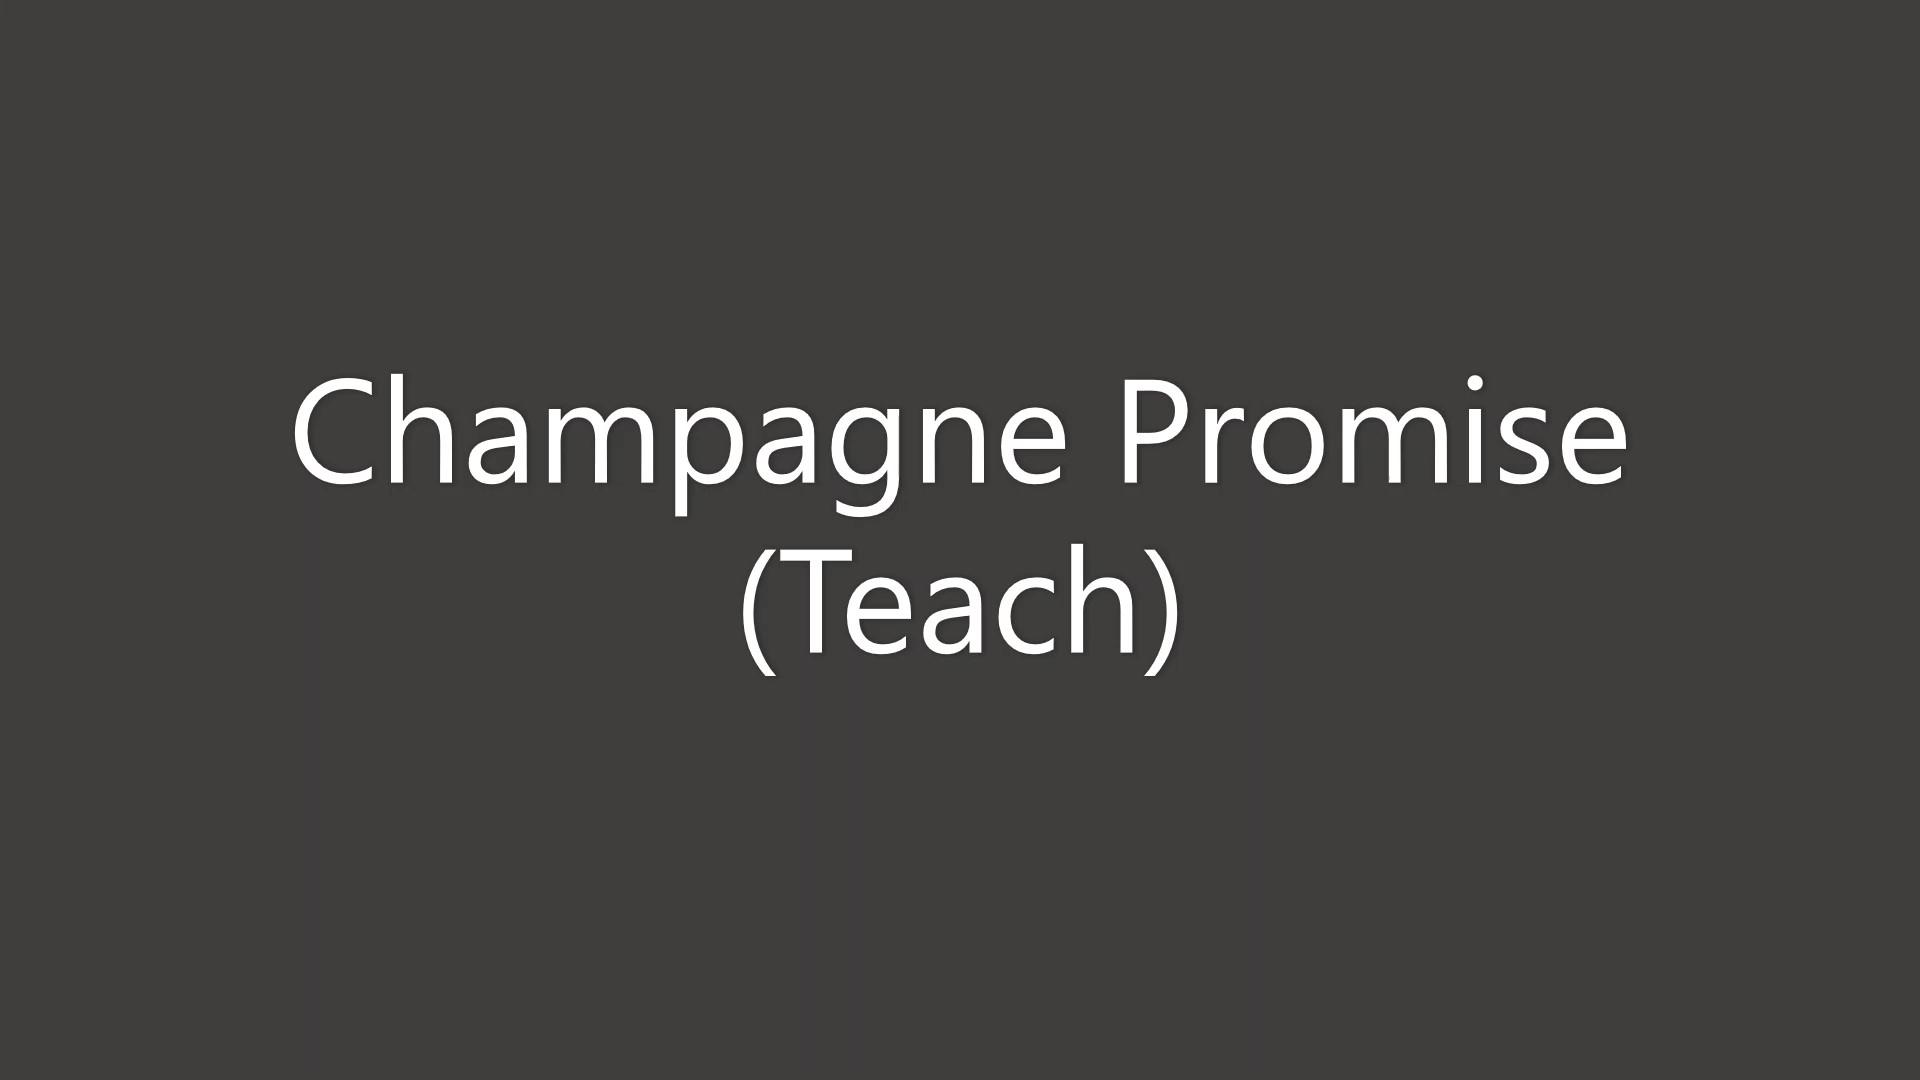 Champagne Promise Teach